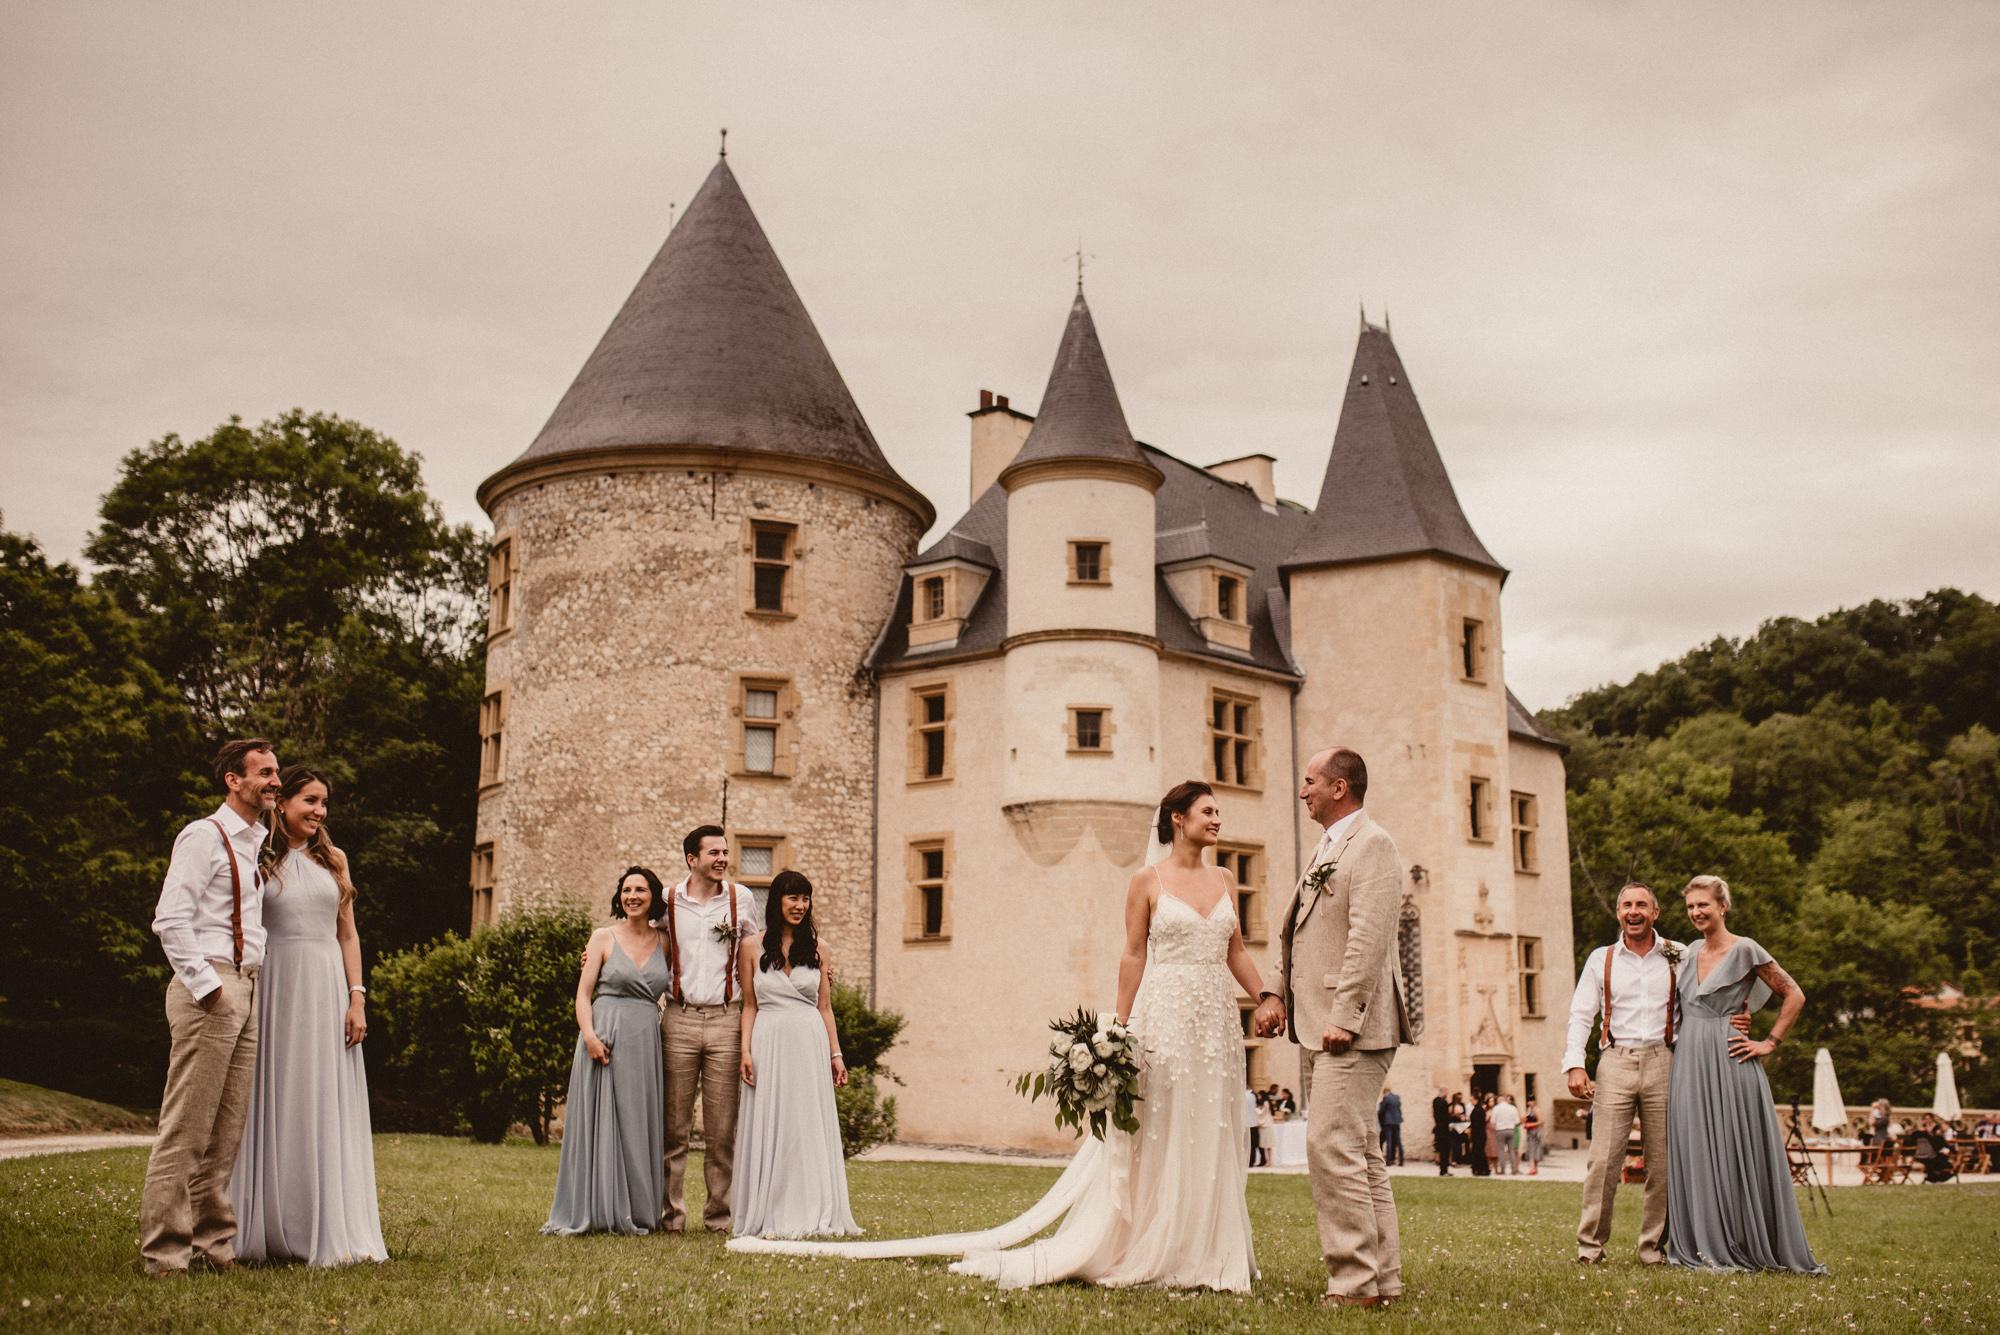 Ivonna & Jason - CHATEAU SAINT MARTORY - FRANCE